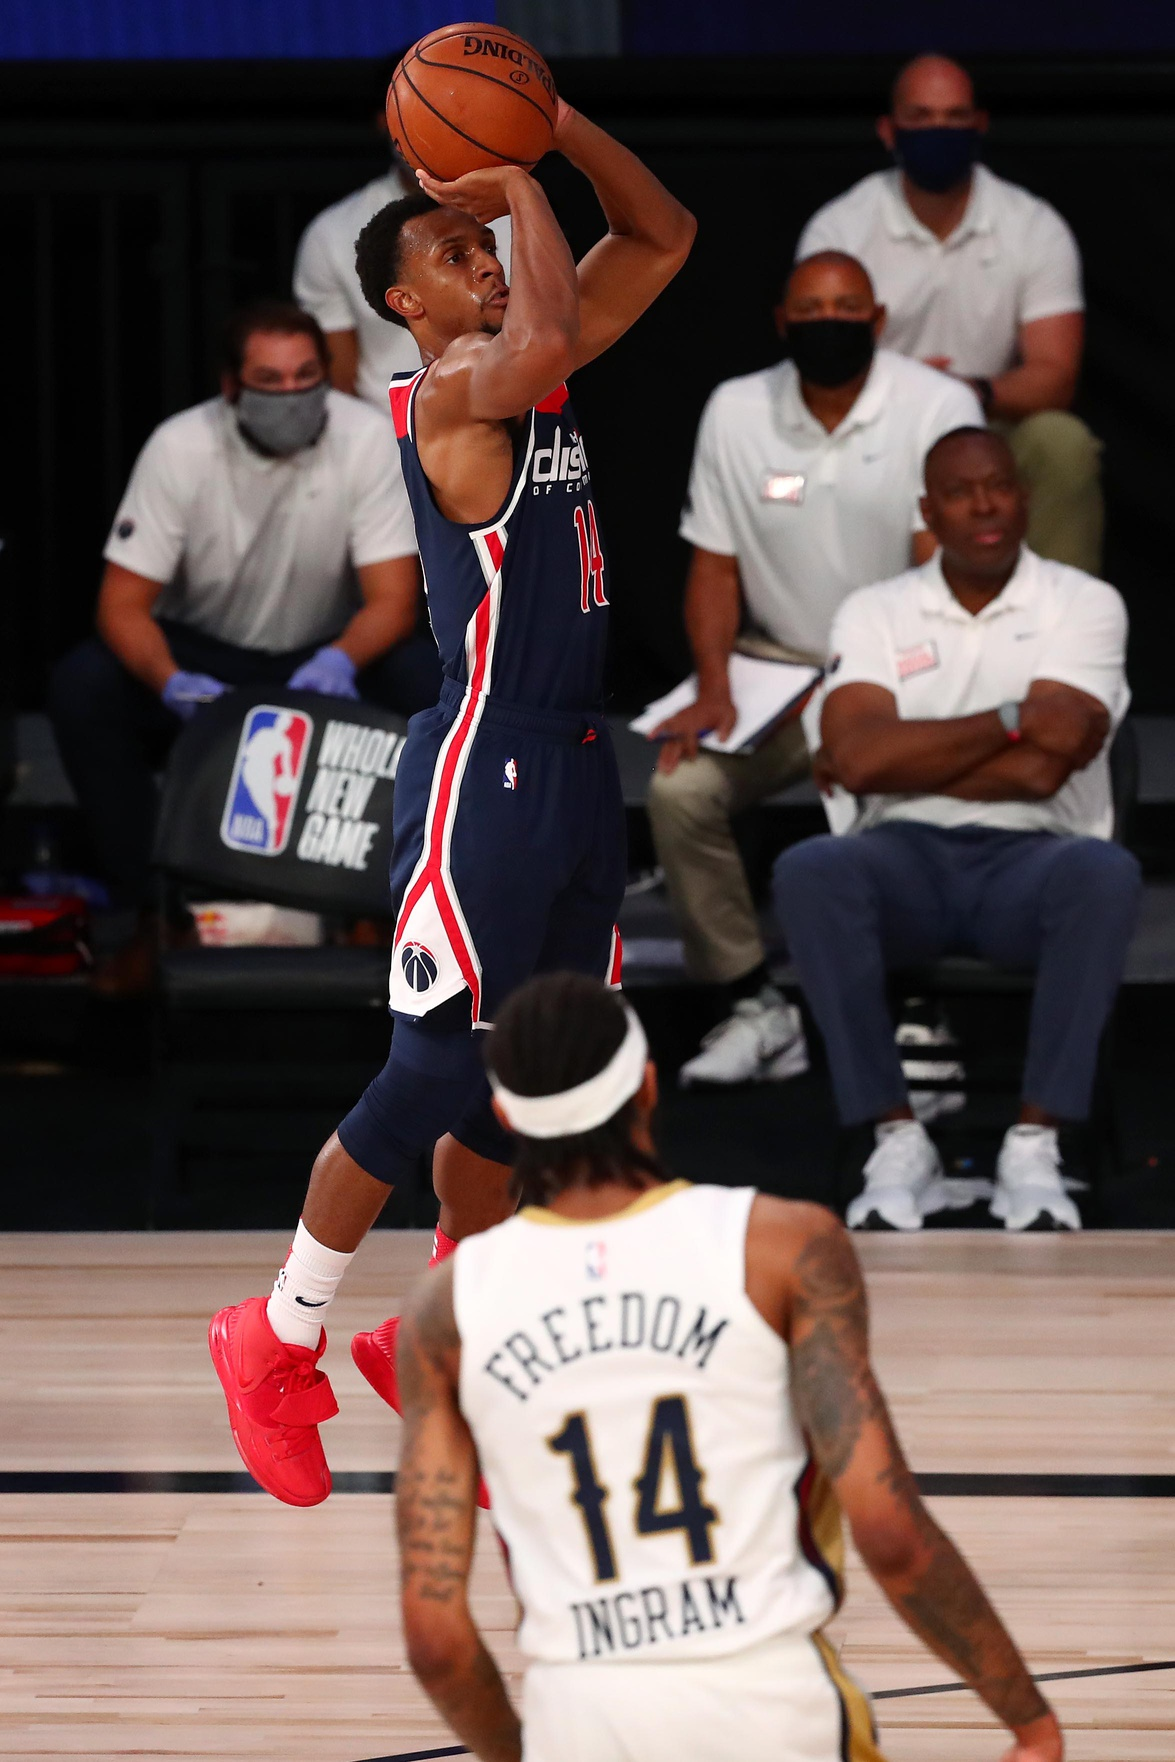 NBA Fantasy Stud of the Night: Ish Smith